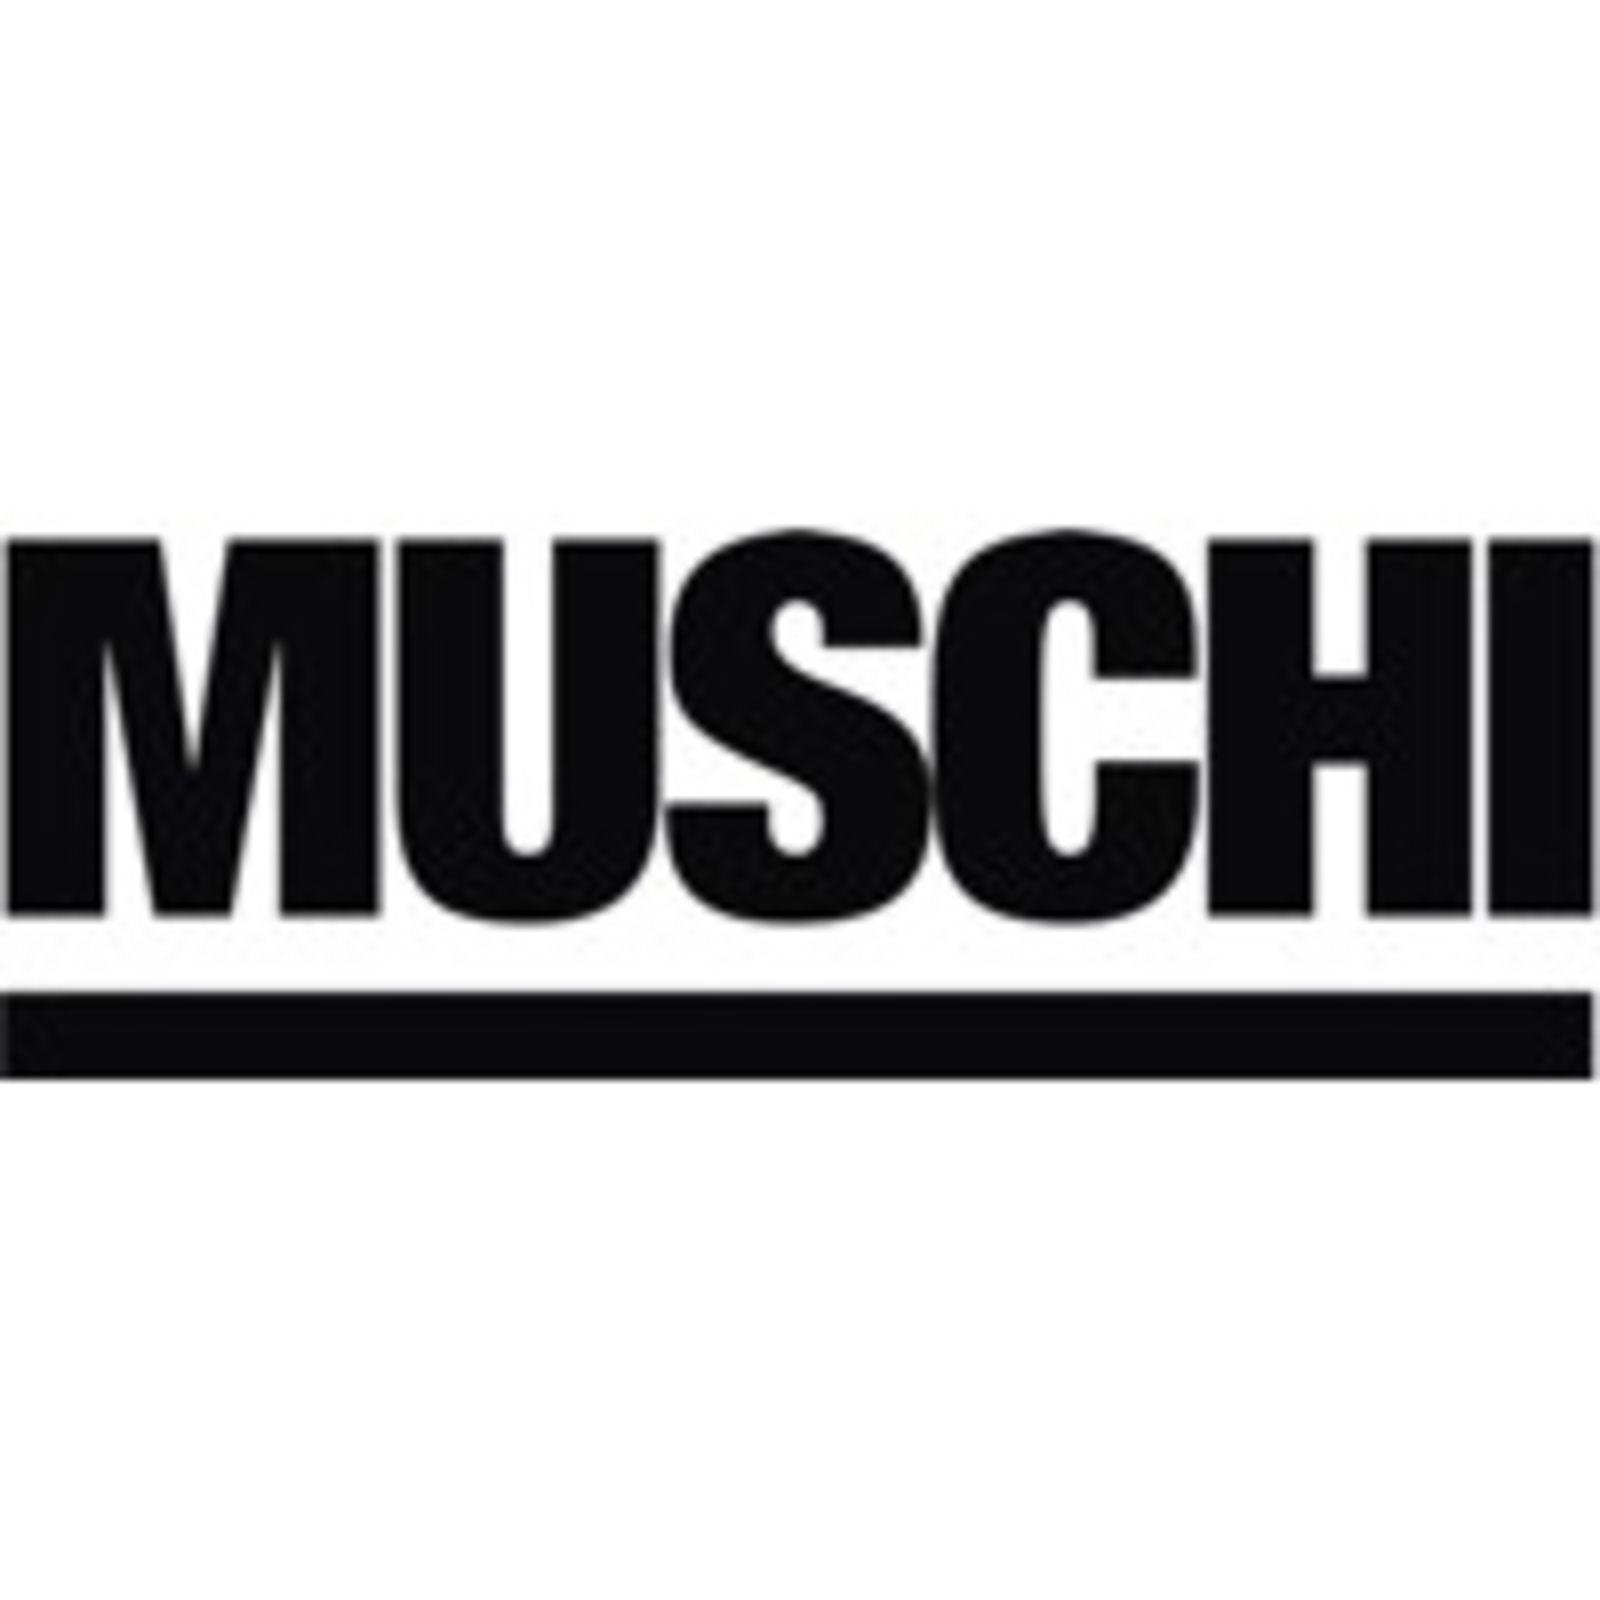 MUSCHI KREUZBERG (Bild 1)